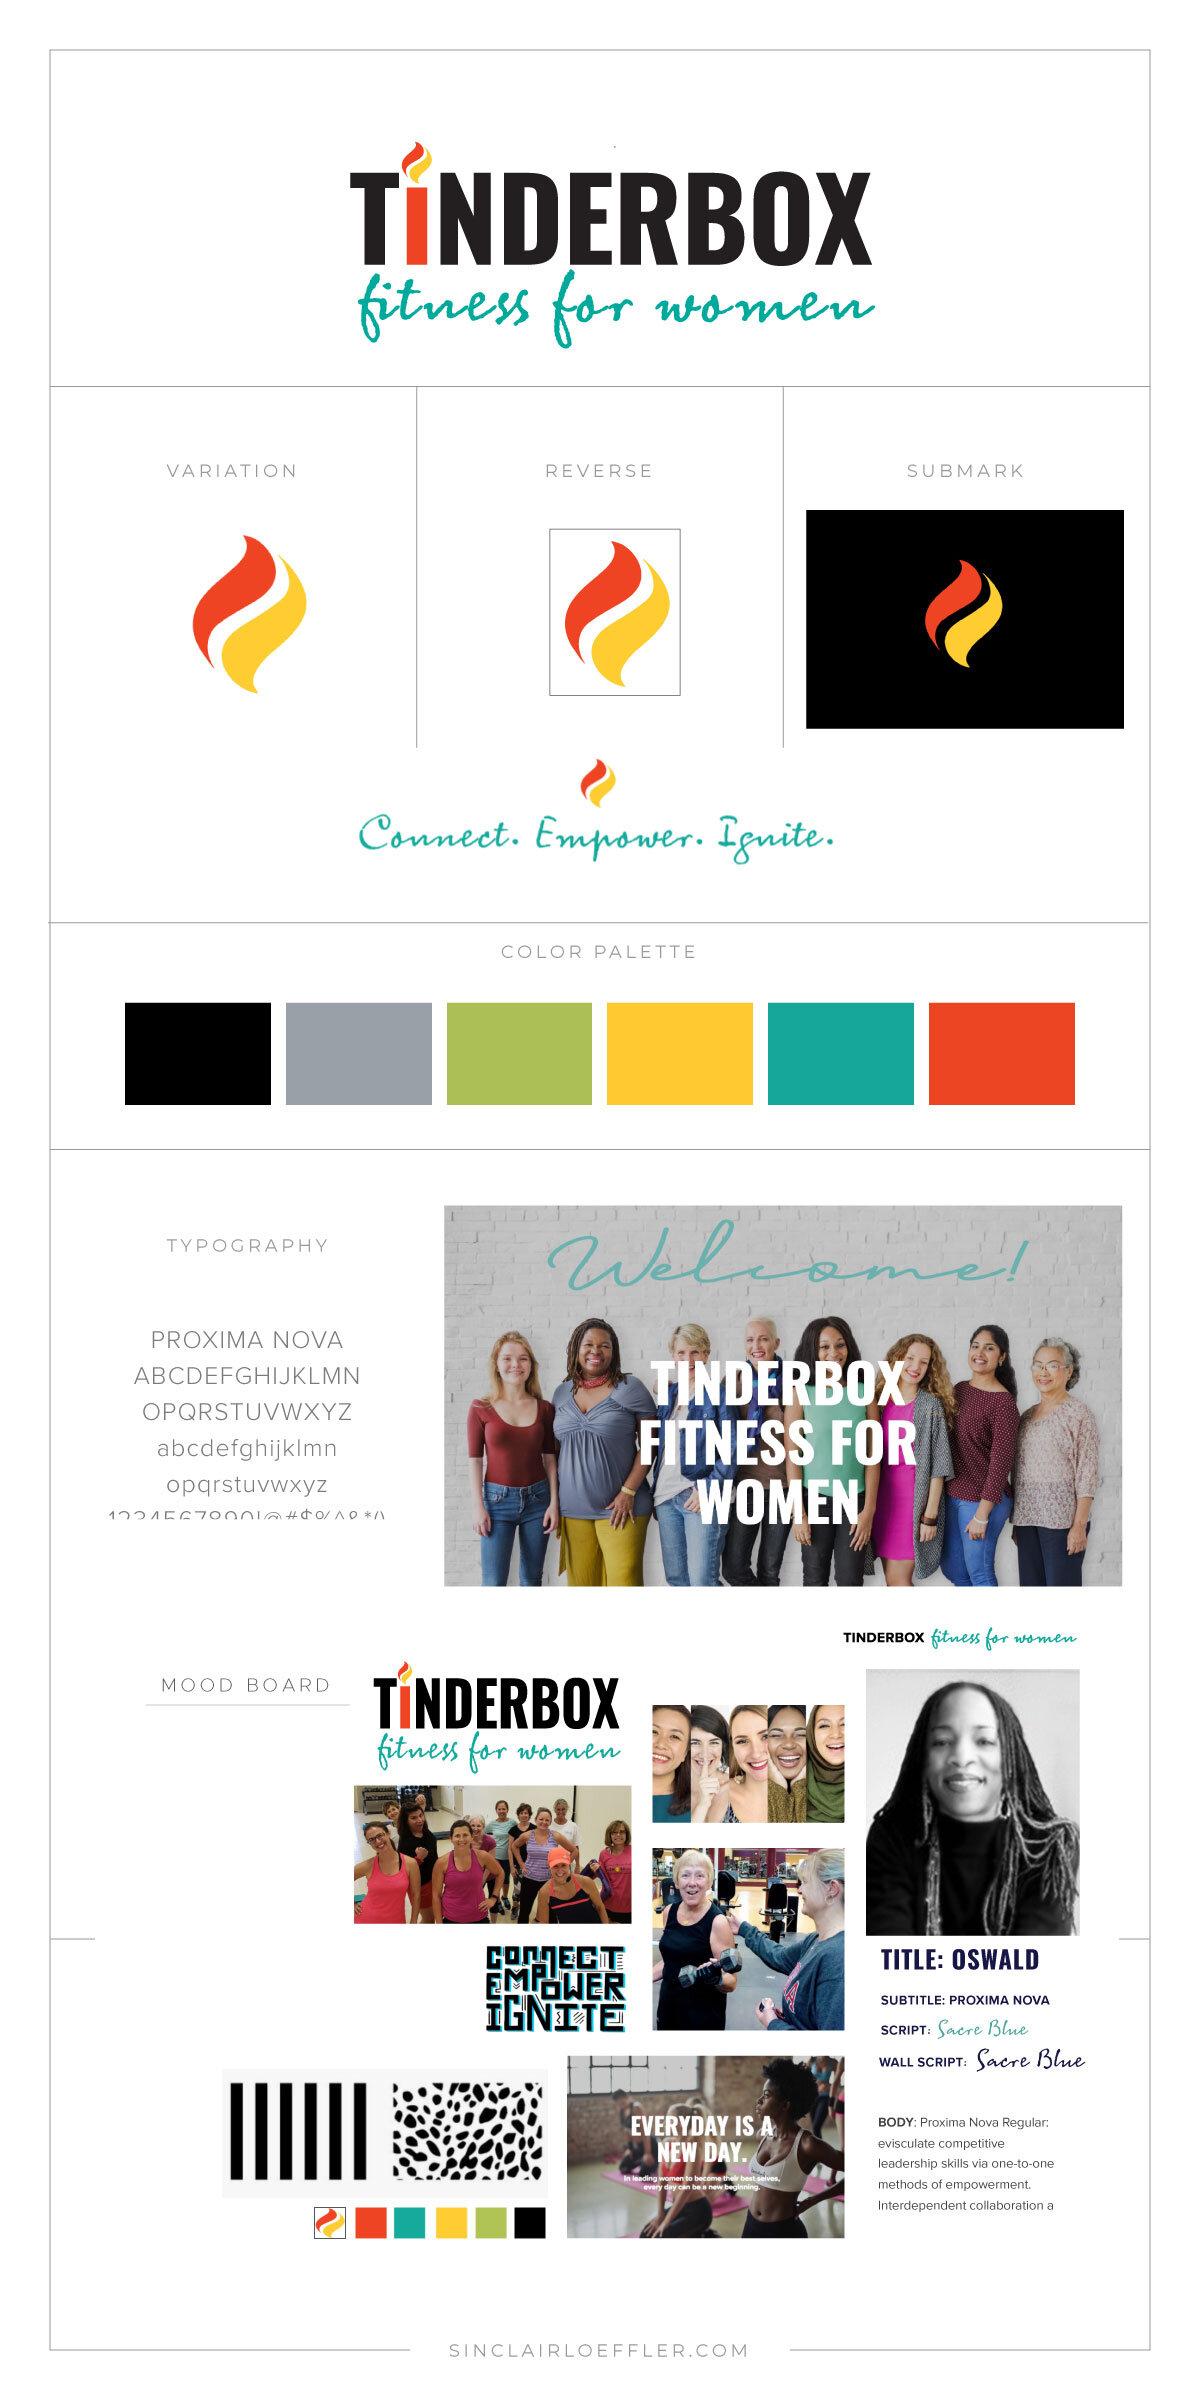 brand-board---style-tile-2-tinderbox.jpg